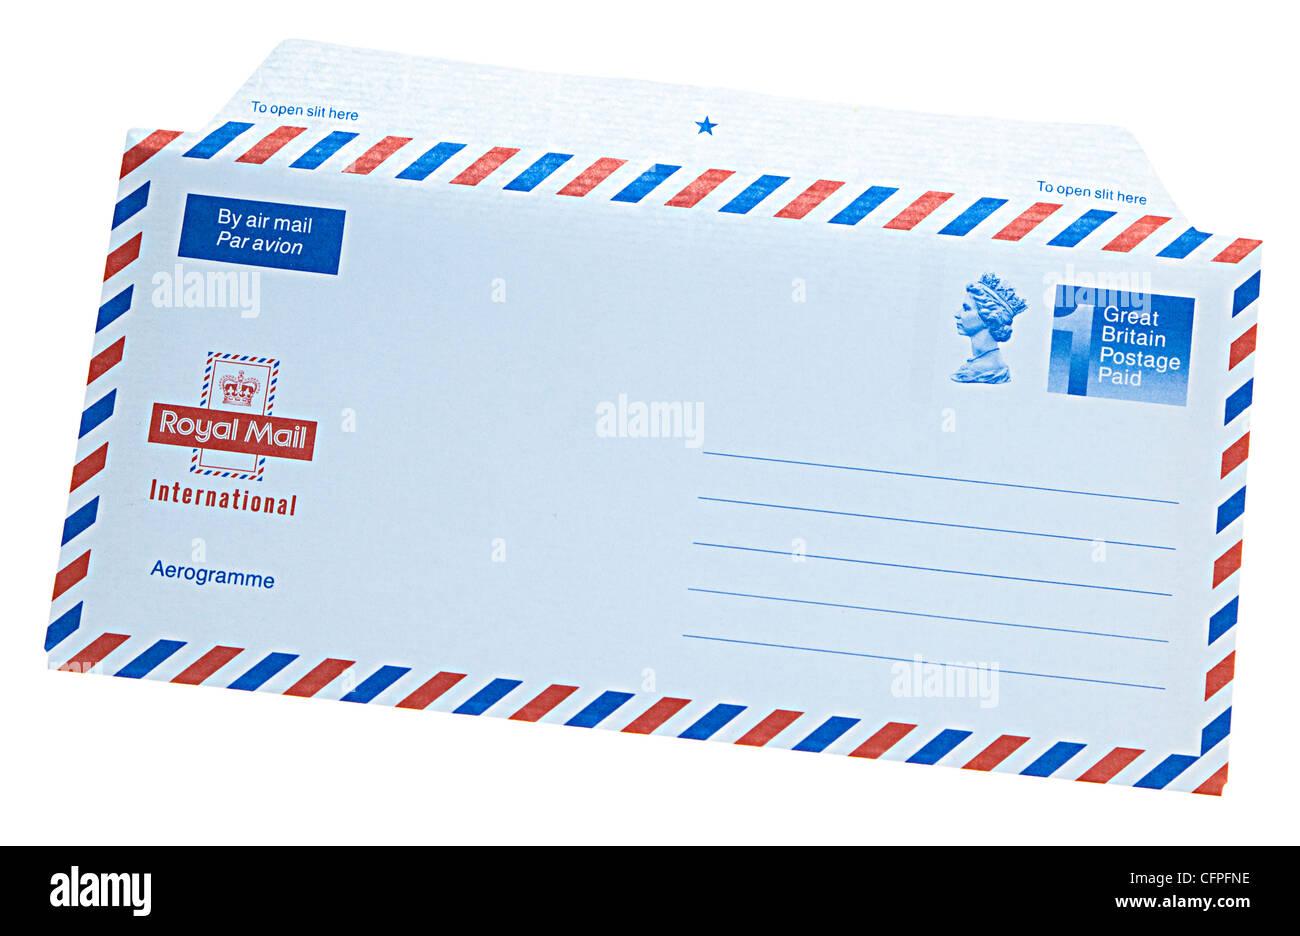 Royal Mail Stock Photos & Royal Mail Stock Images